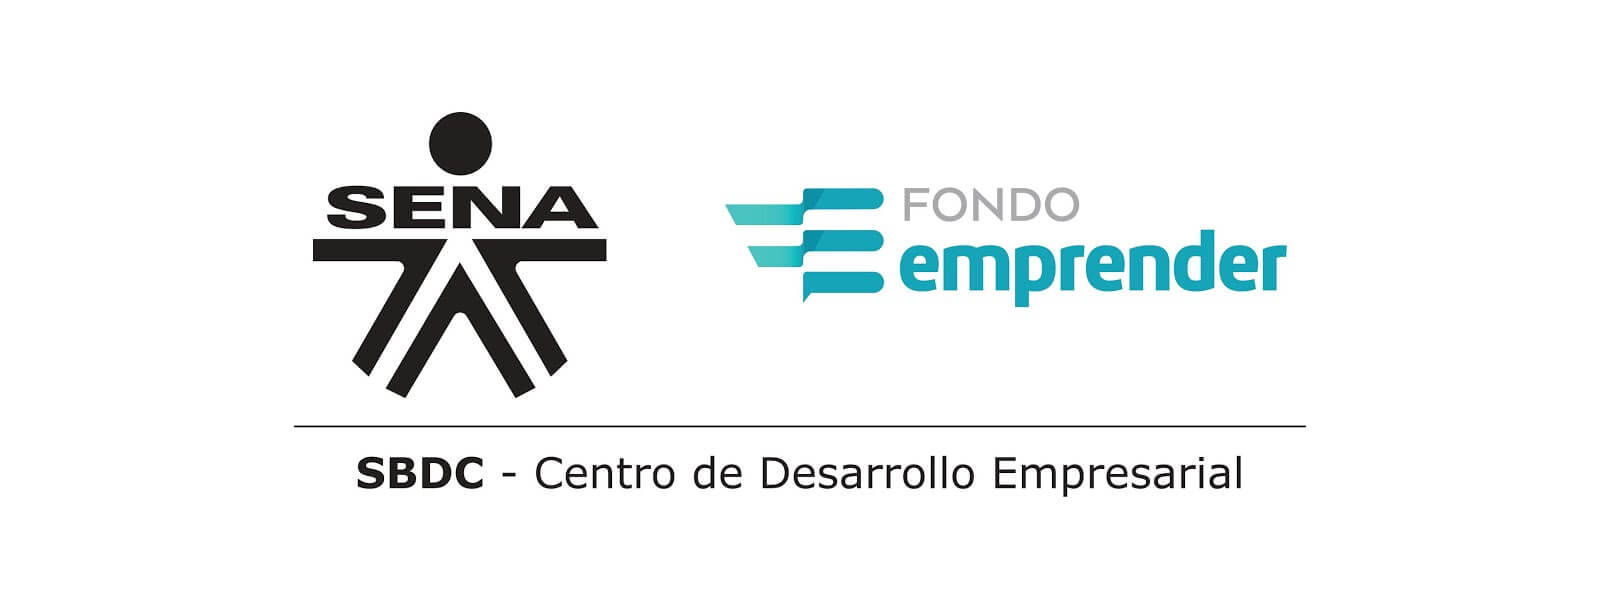 Fondo emprender - Kapital Stereo 107.3 FM - Noticias Arauca   1600 x 611 jpeg 28kB